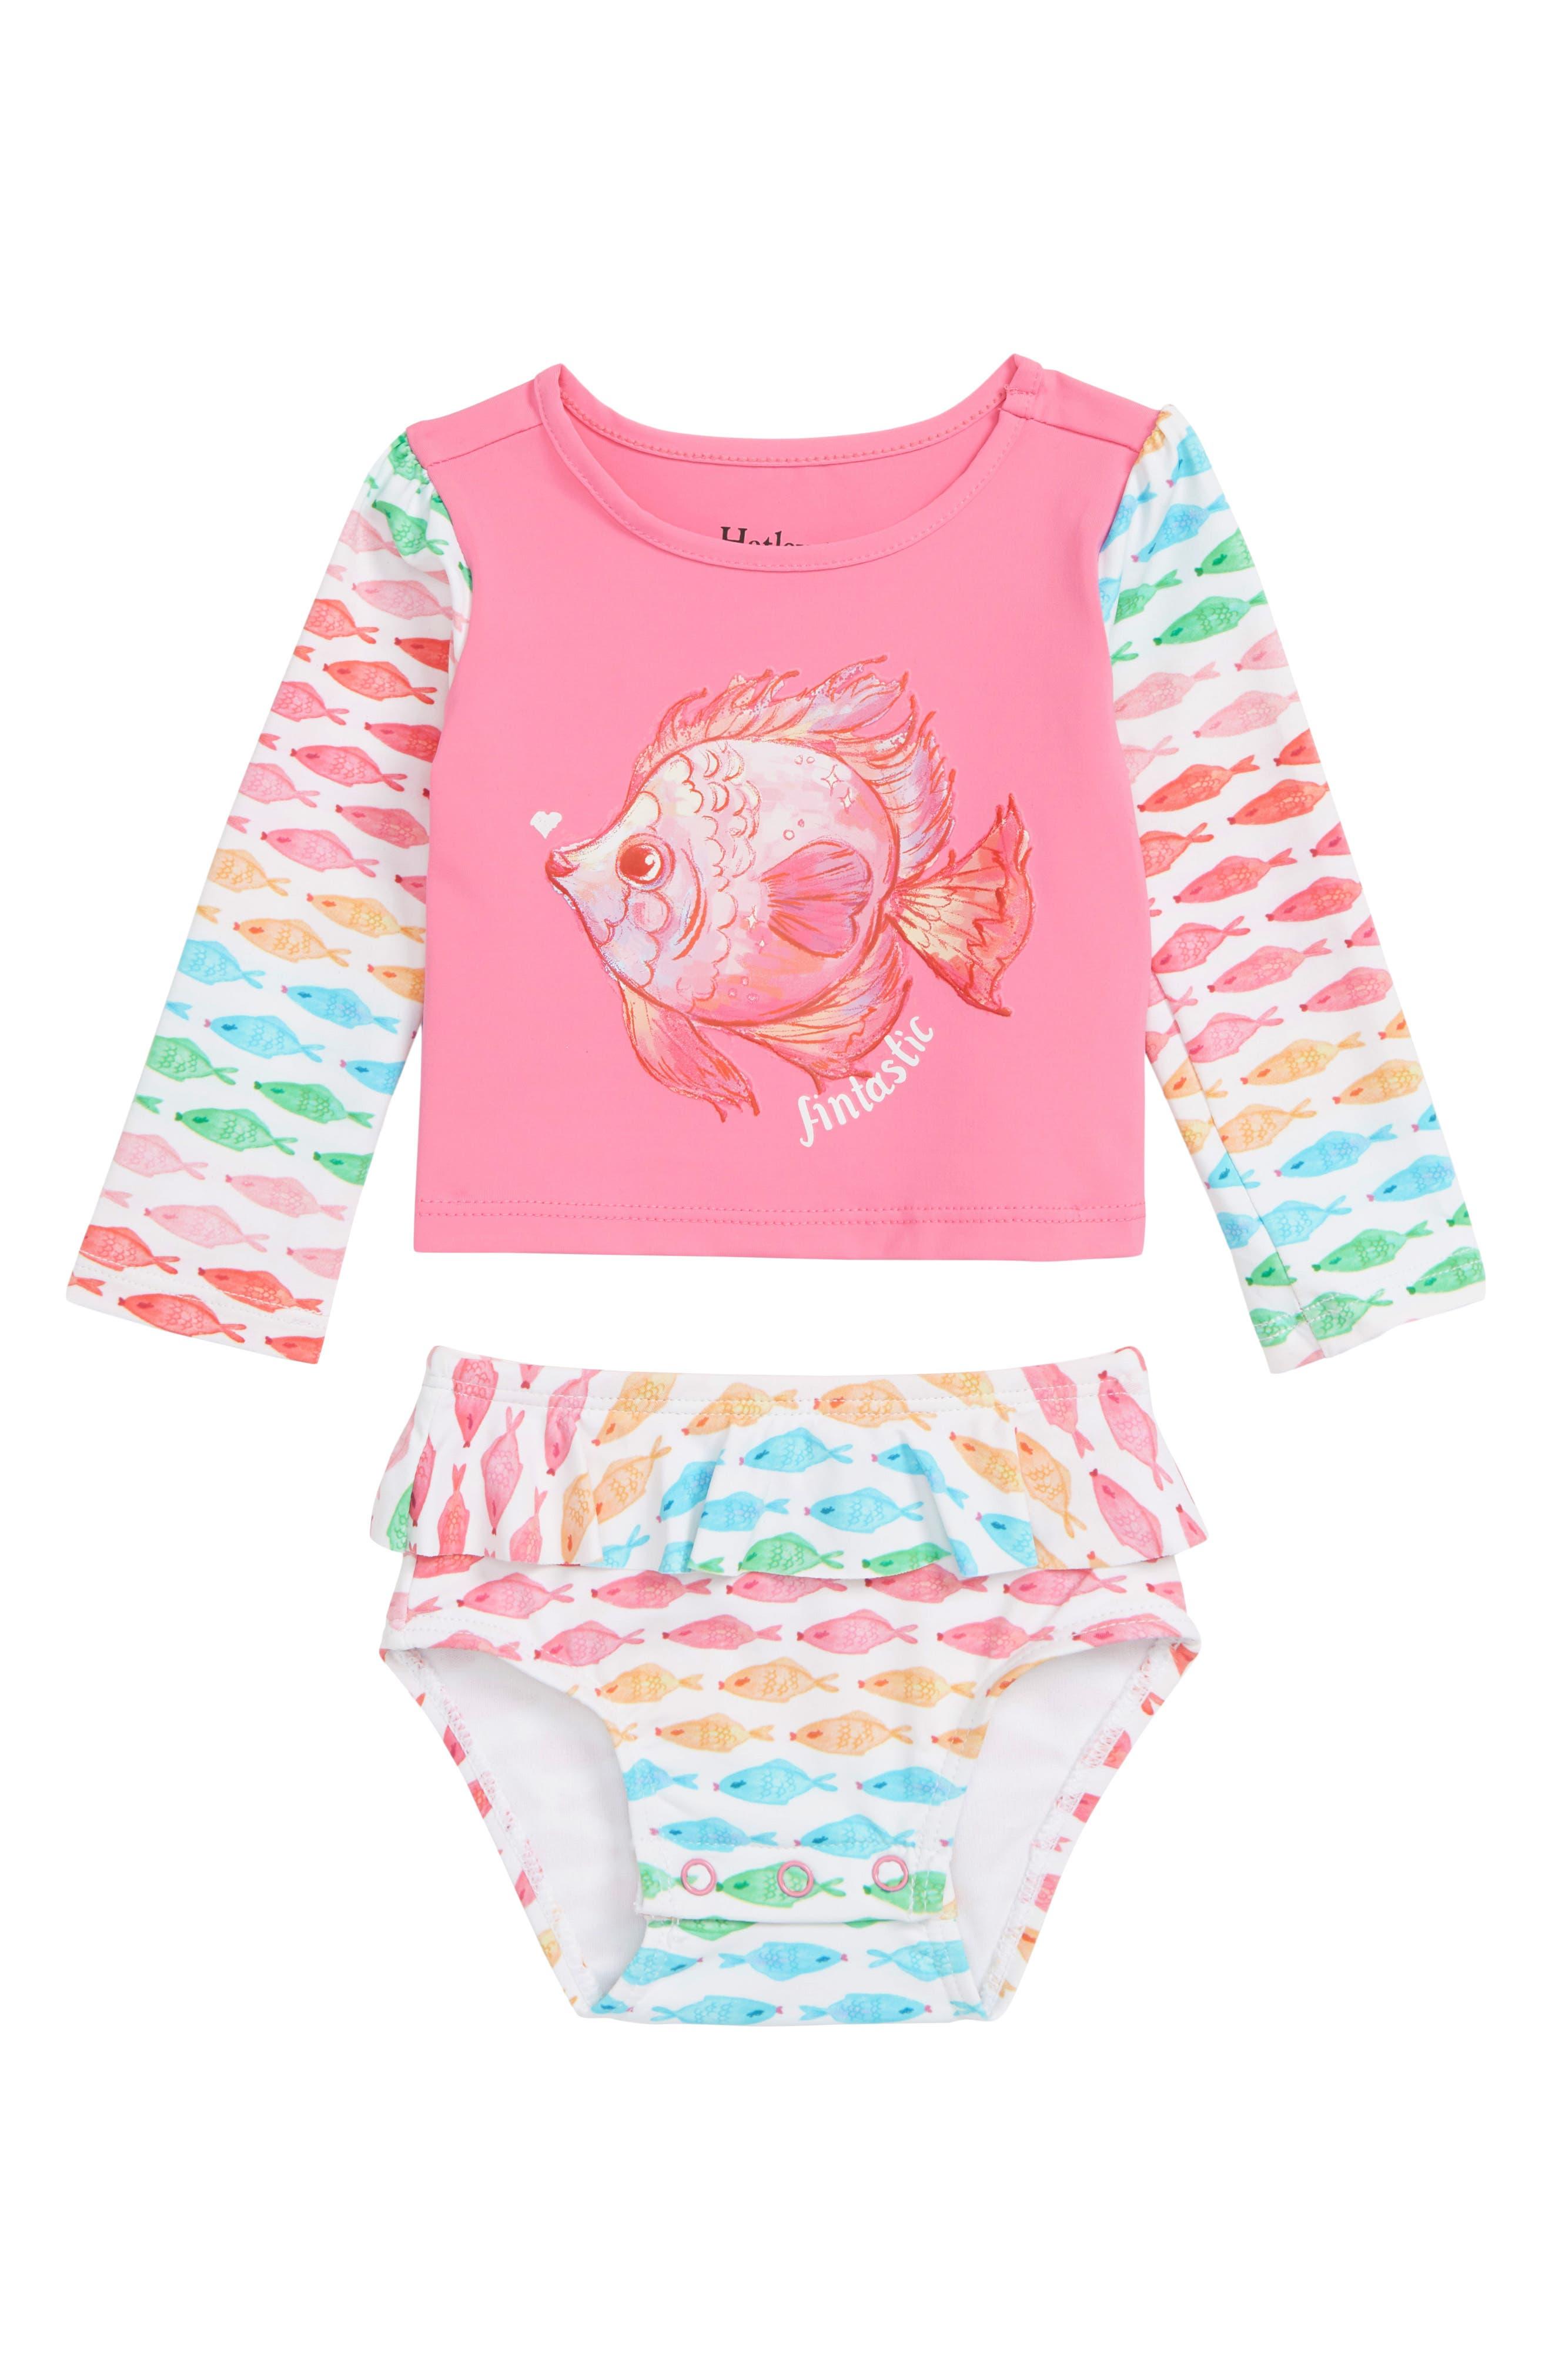 HATLEY, Watercolor Fishies Two-Piece Rashguard Swimsuit, Main thumbnail 1, color, PINK